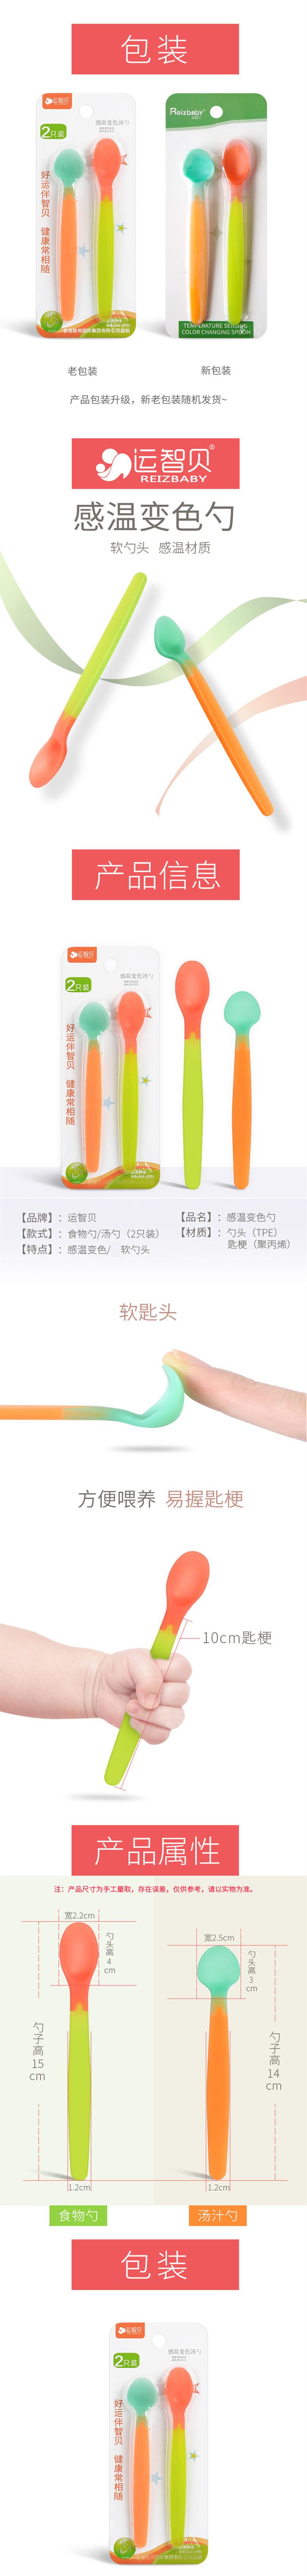 https://xiaoba.shall-buy.com/attachment/images/13938/2019/07/AUmAU0690610P0v61E00bwatWE06y0.jpg